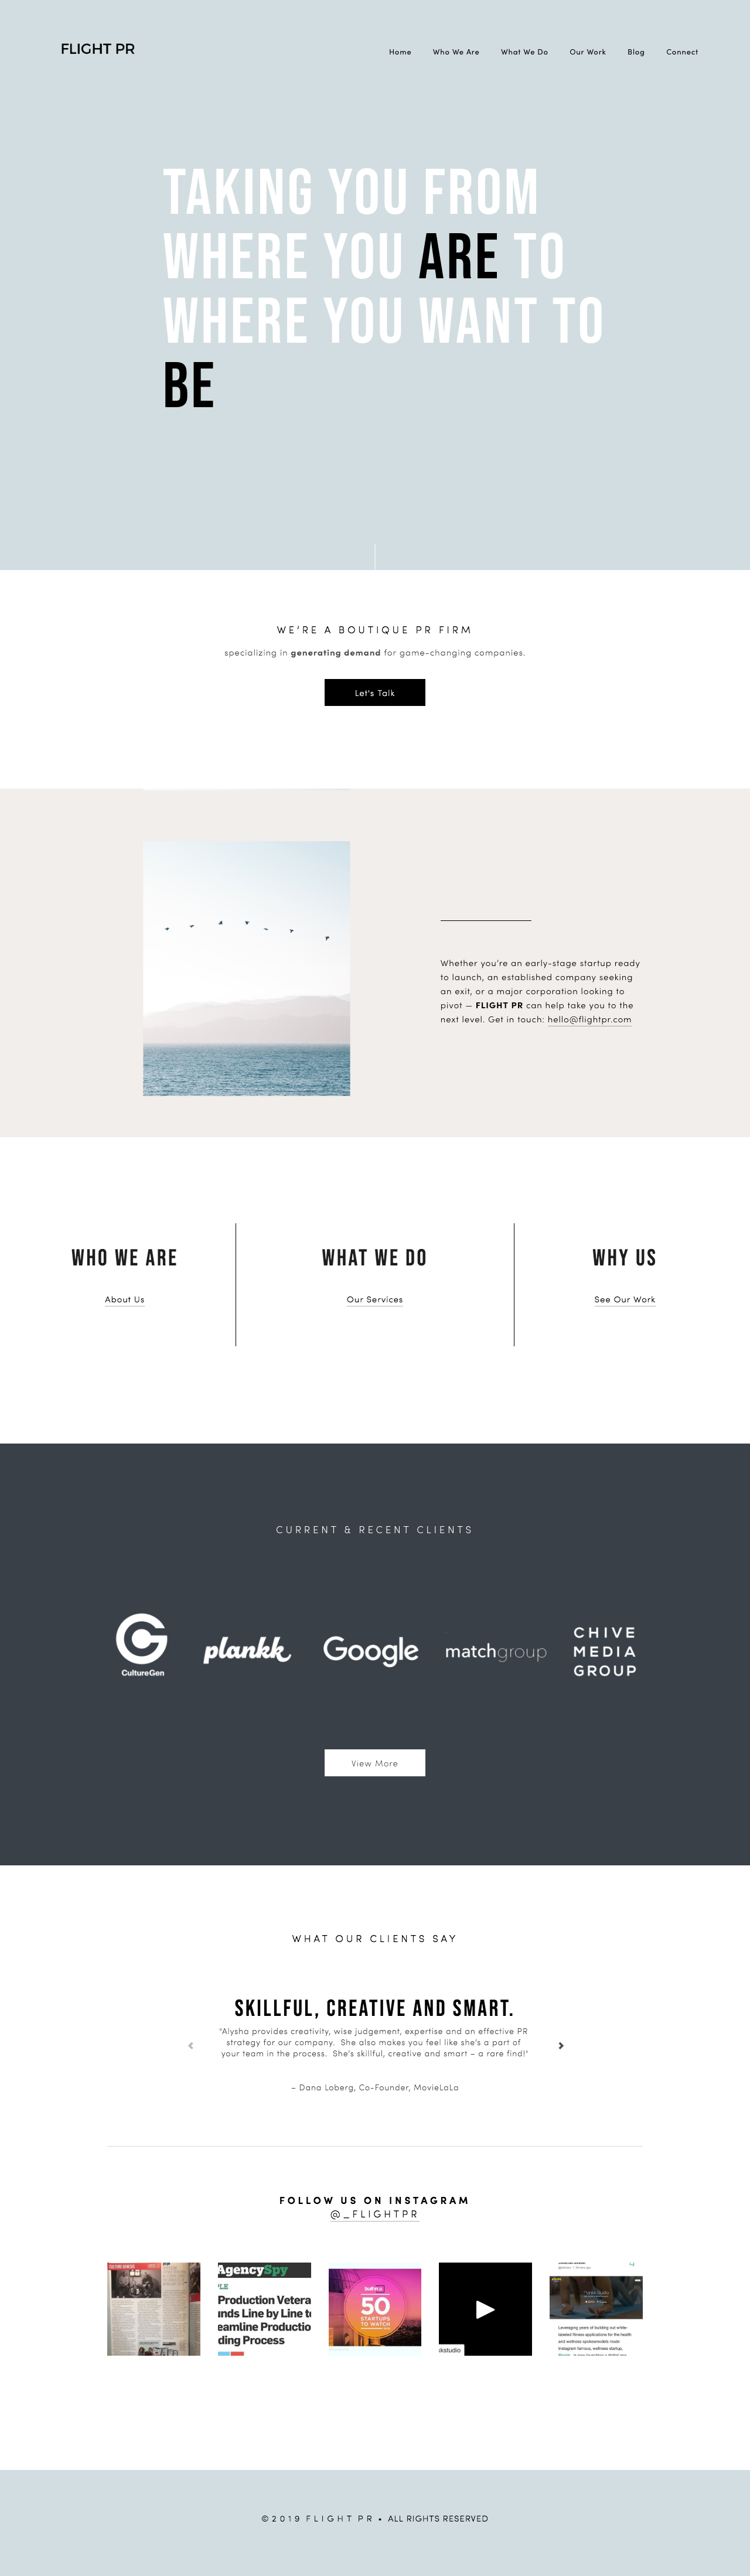 Flight-Pr-Best-Examples-of-Squarespace-Website-for-Marketing-Businesses.jpg